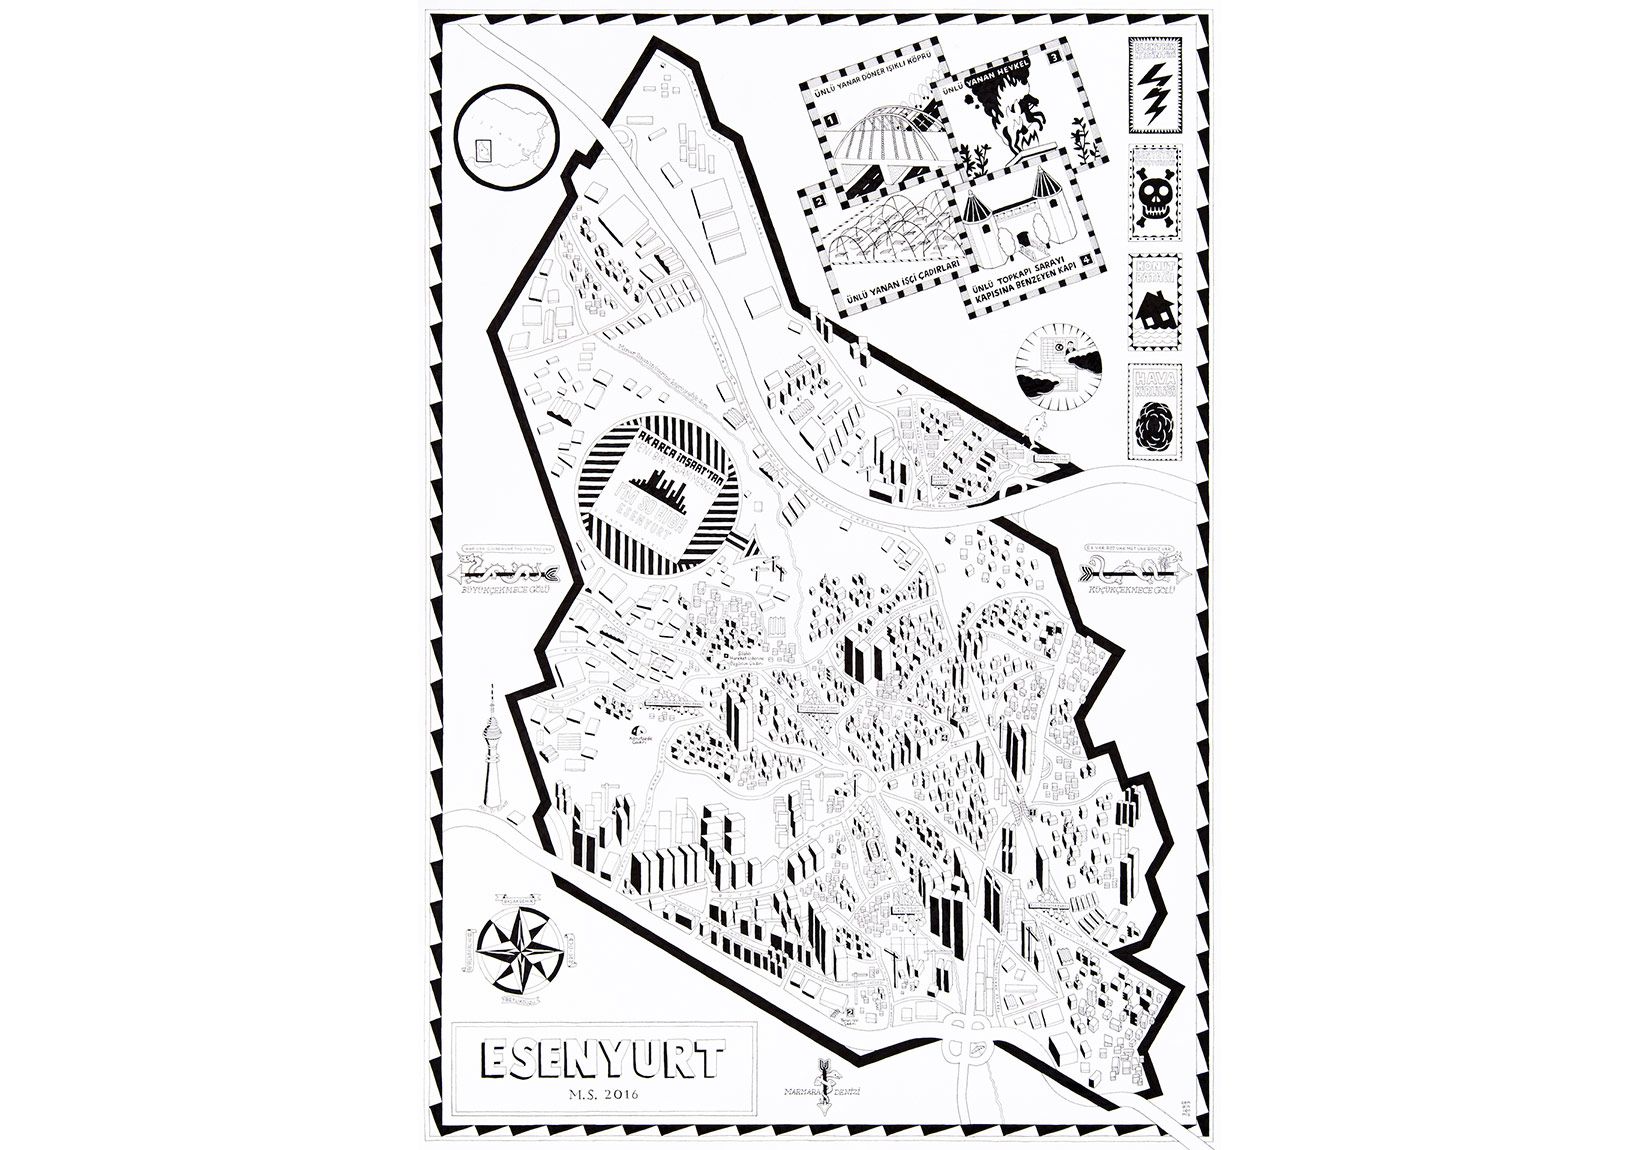 Cem Dinlenmiş, Esenyurt M. S. 2016,Kağıt üstüne dolmakalem, 100 x 70 cm, 2015